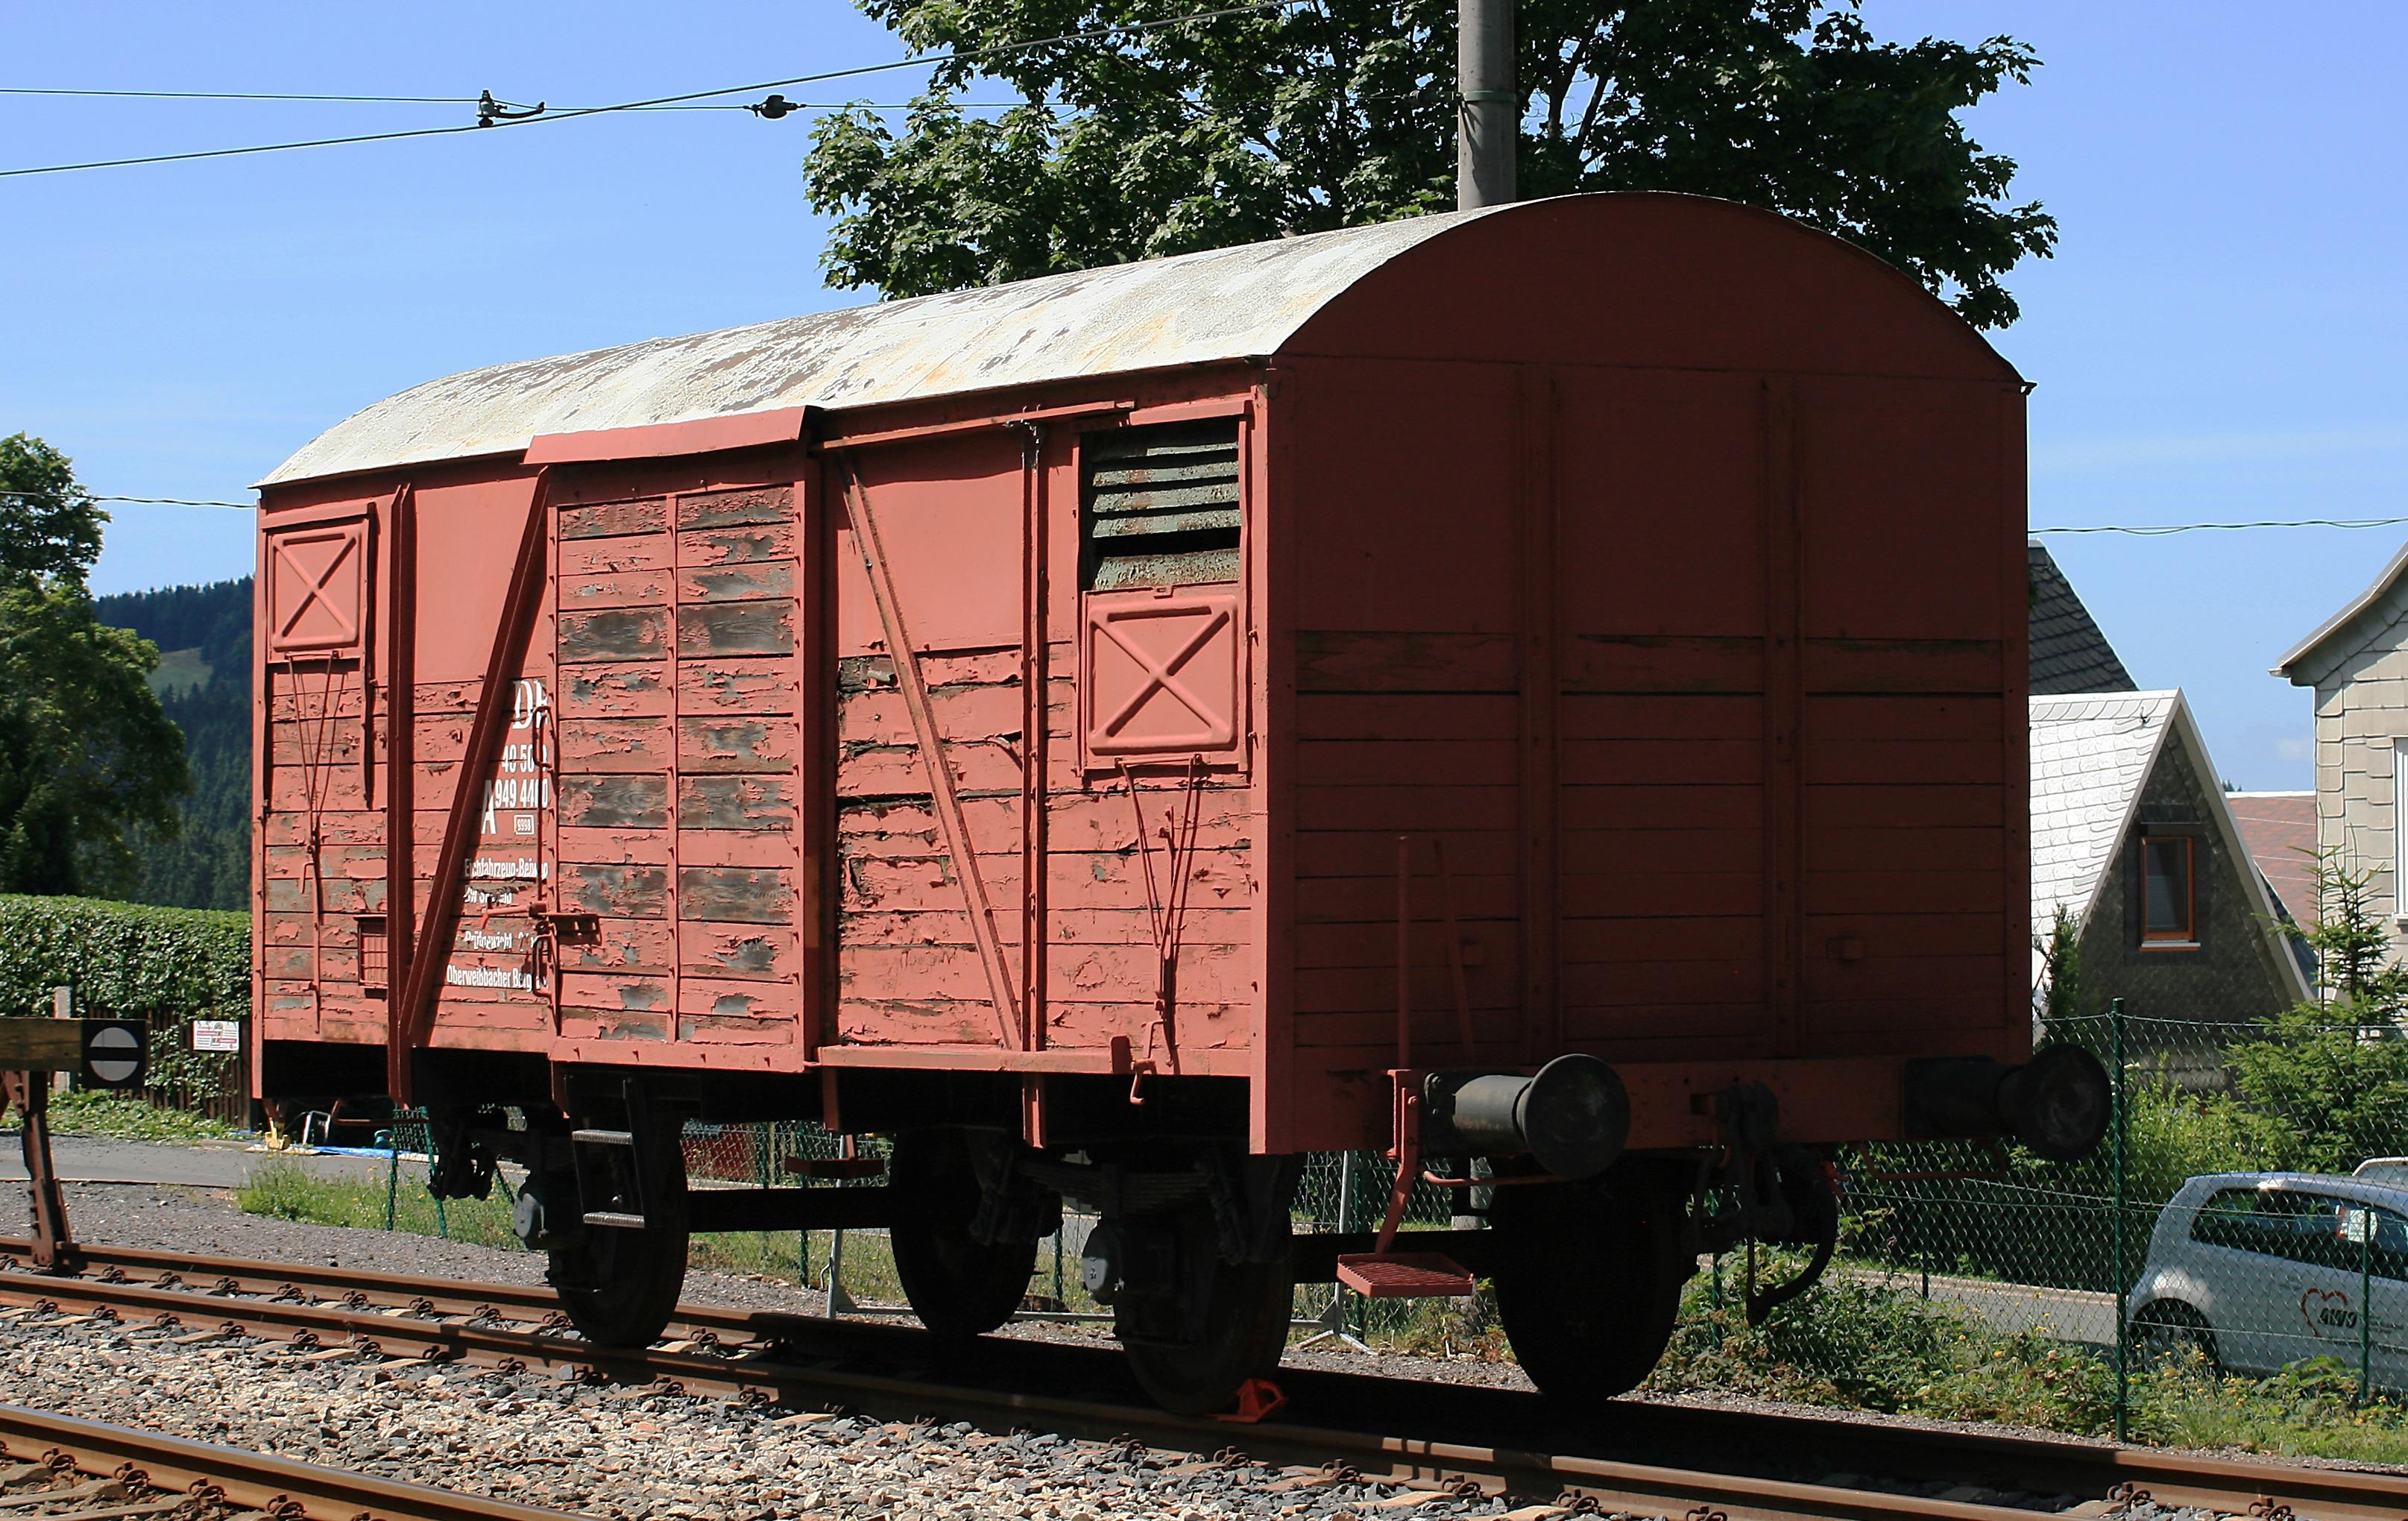 Fotograf Iz Yuk Vagonu Eski Tren Nakliye Kirmizi Arac